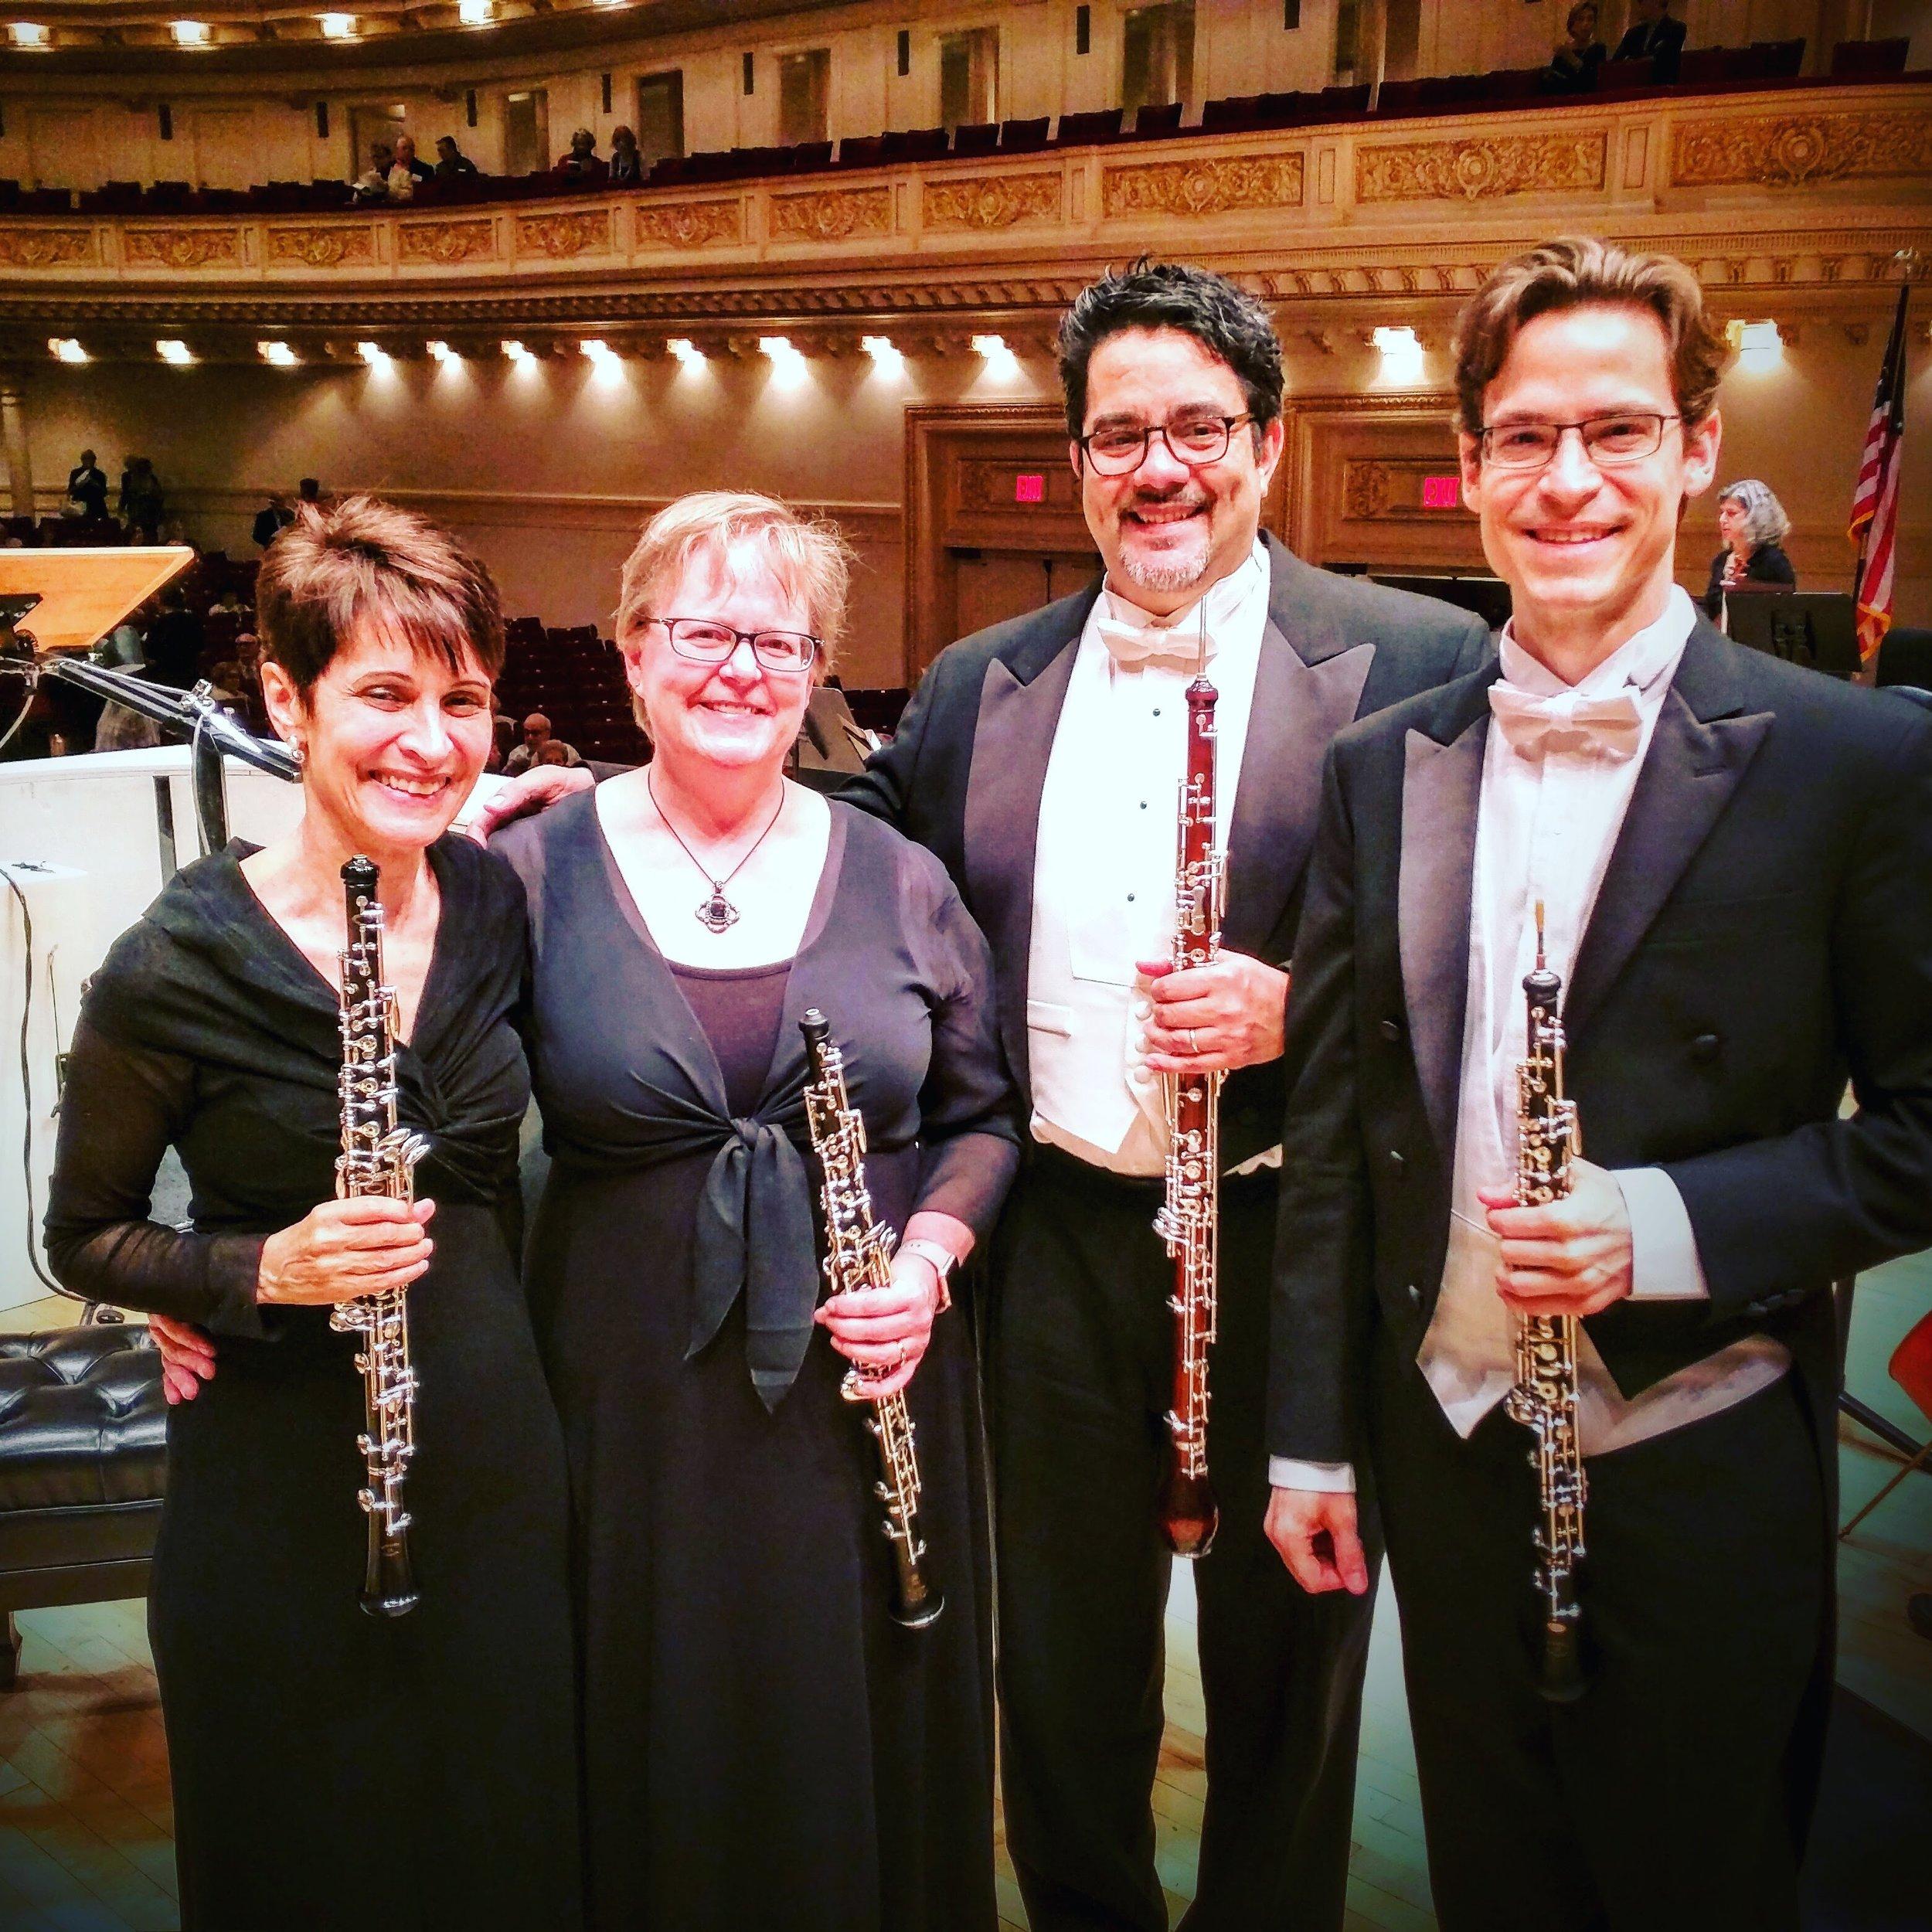 (L-R) MET Orchestra oboists Elaine Douvas, Susan Spector, Pedro Díaz, and Nathan Hughes